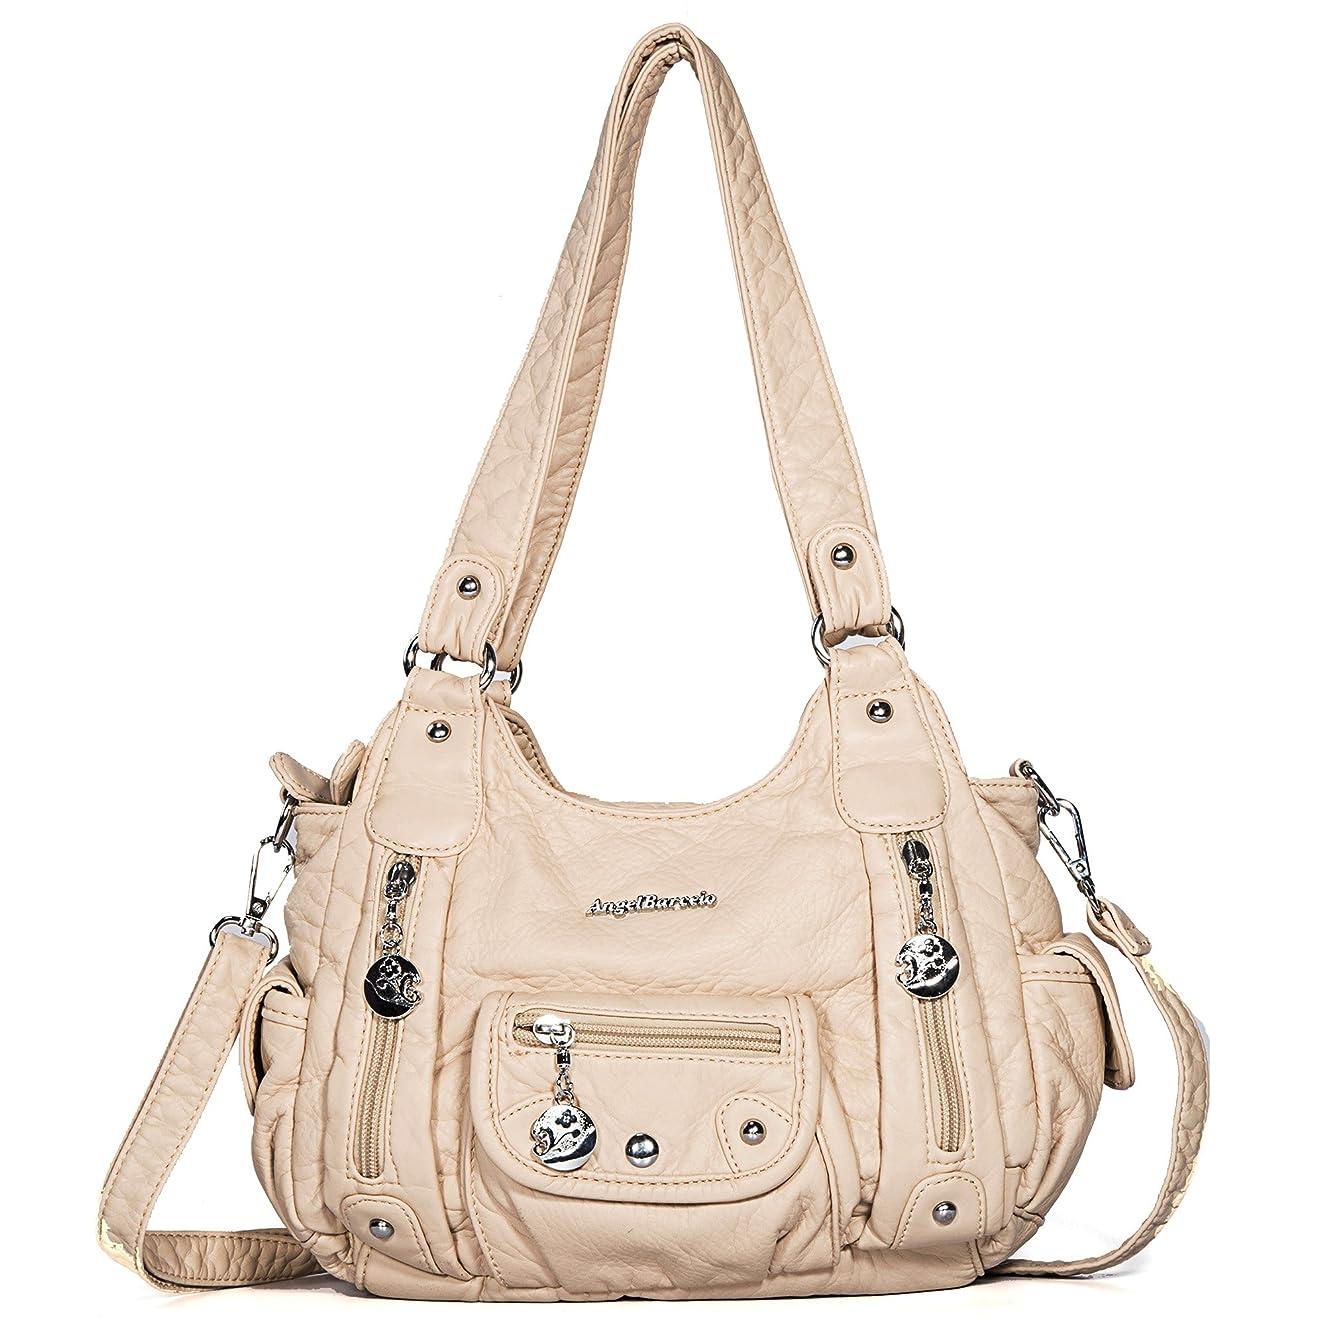 Handbag Hobo Women Bag Roomy Multiple Pockets Street ladies' Shoulder Bag Fashion PU Tote Bag